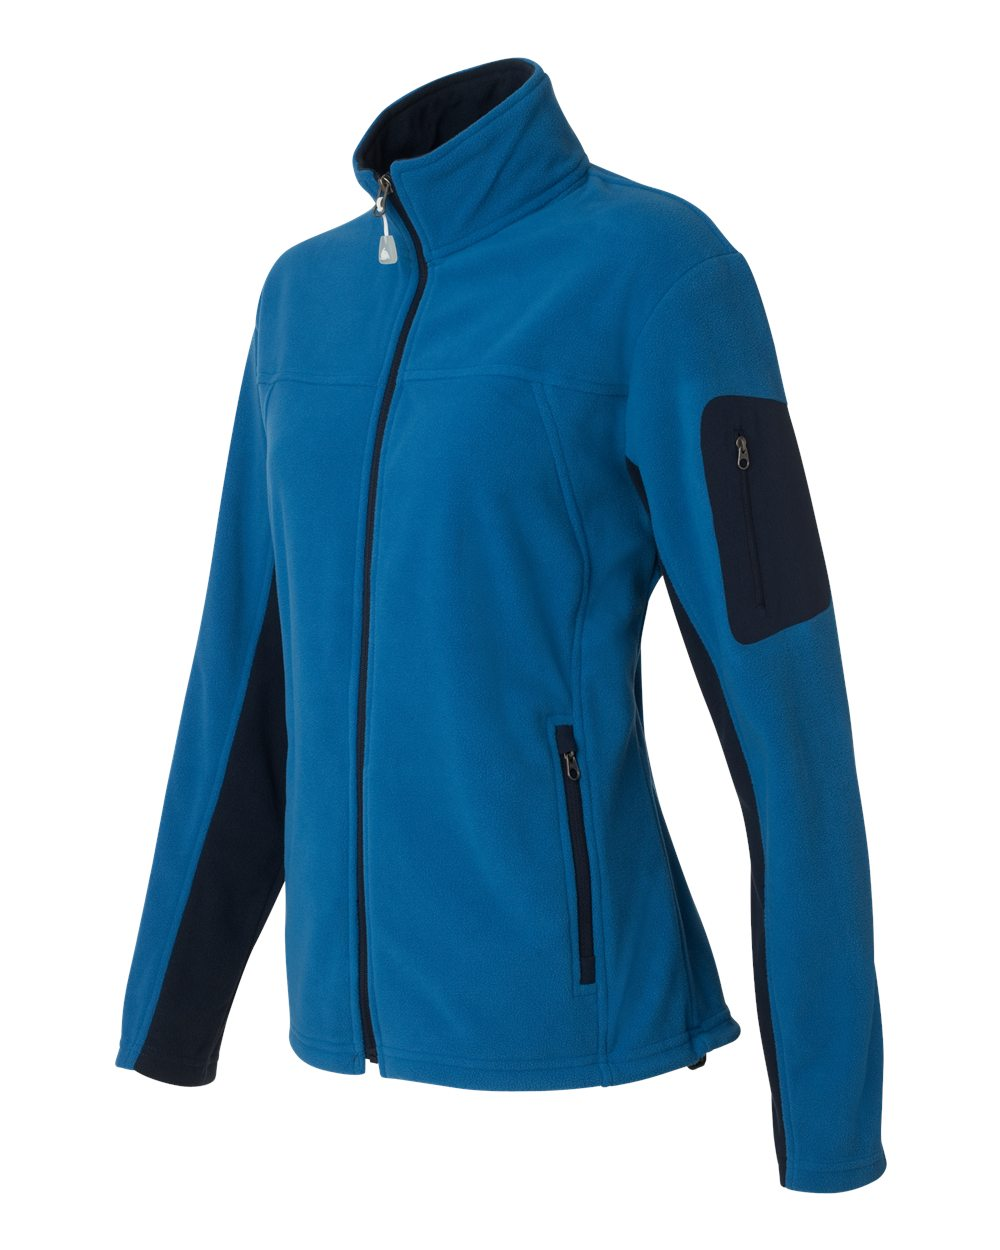 Colorado Clothing 5297 - Ladies' Colorblocked Full-Zip Microfleece Jacket